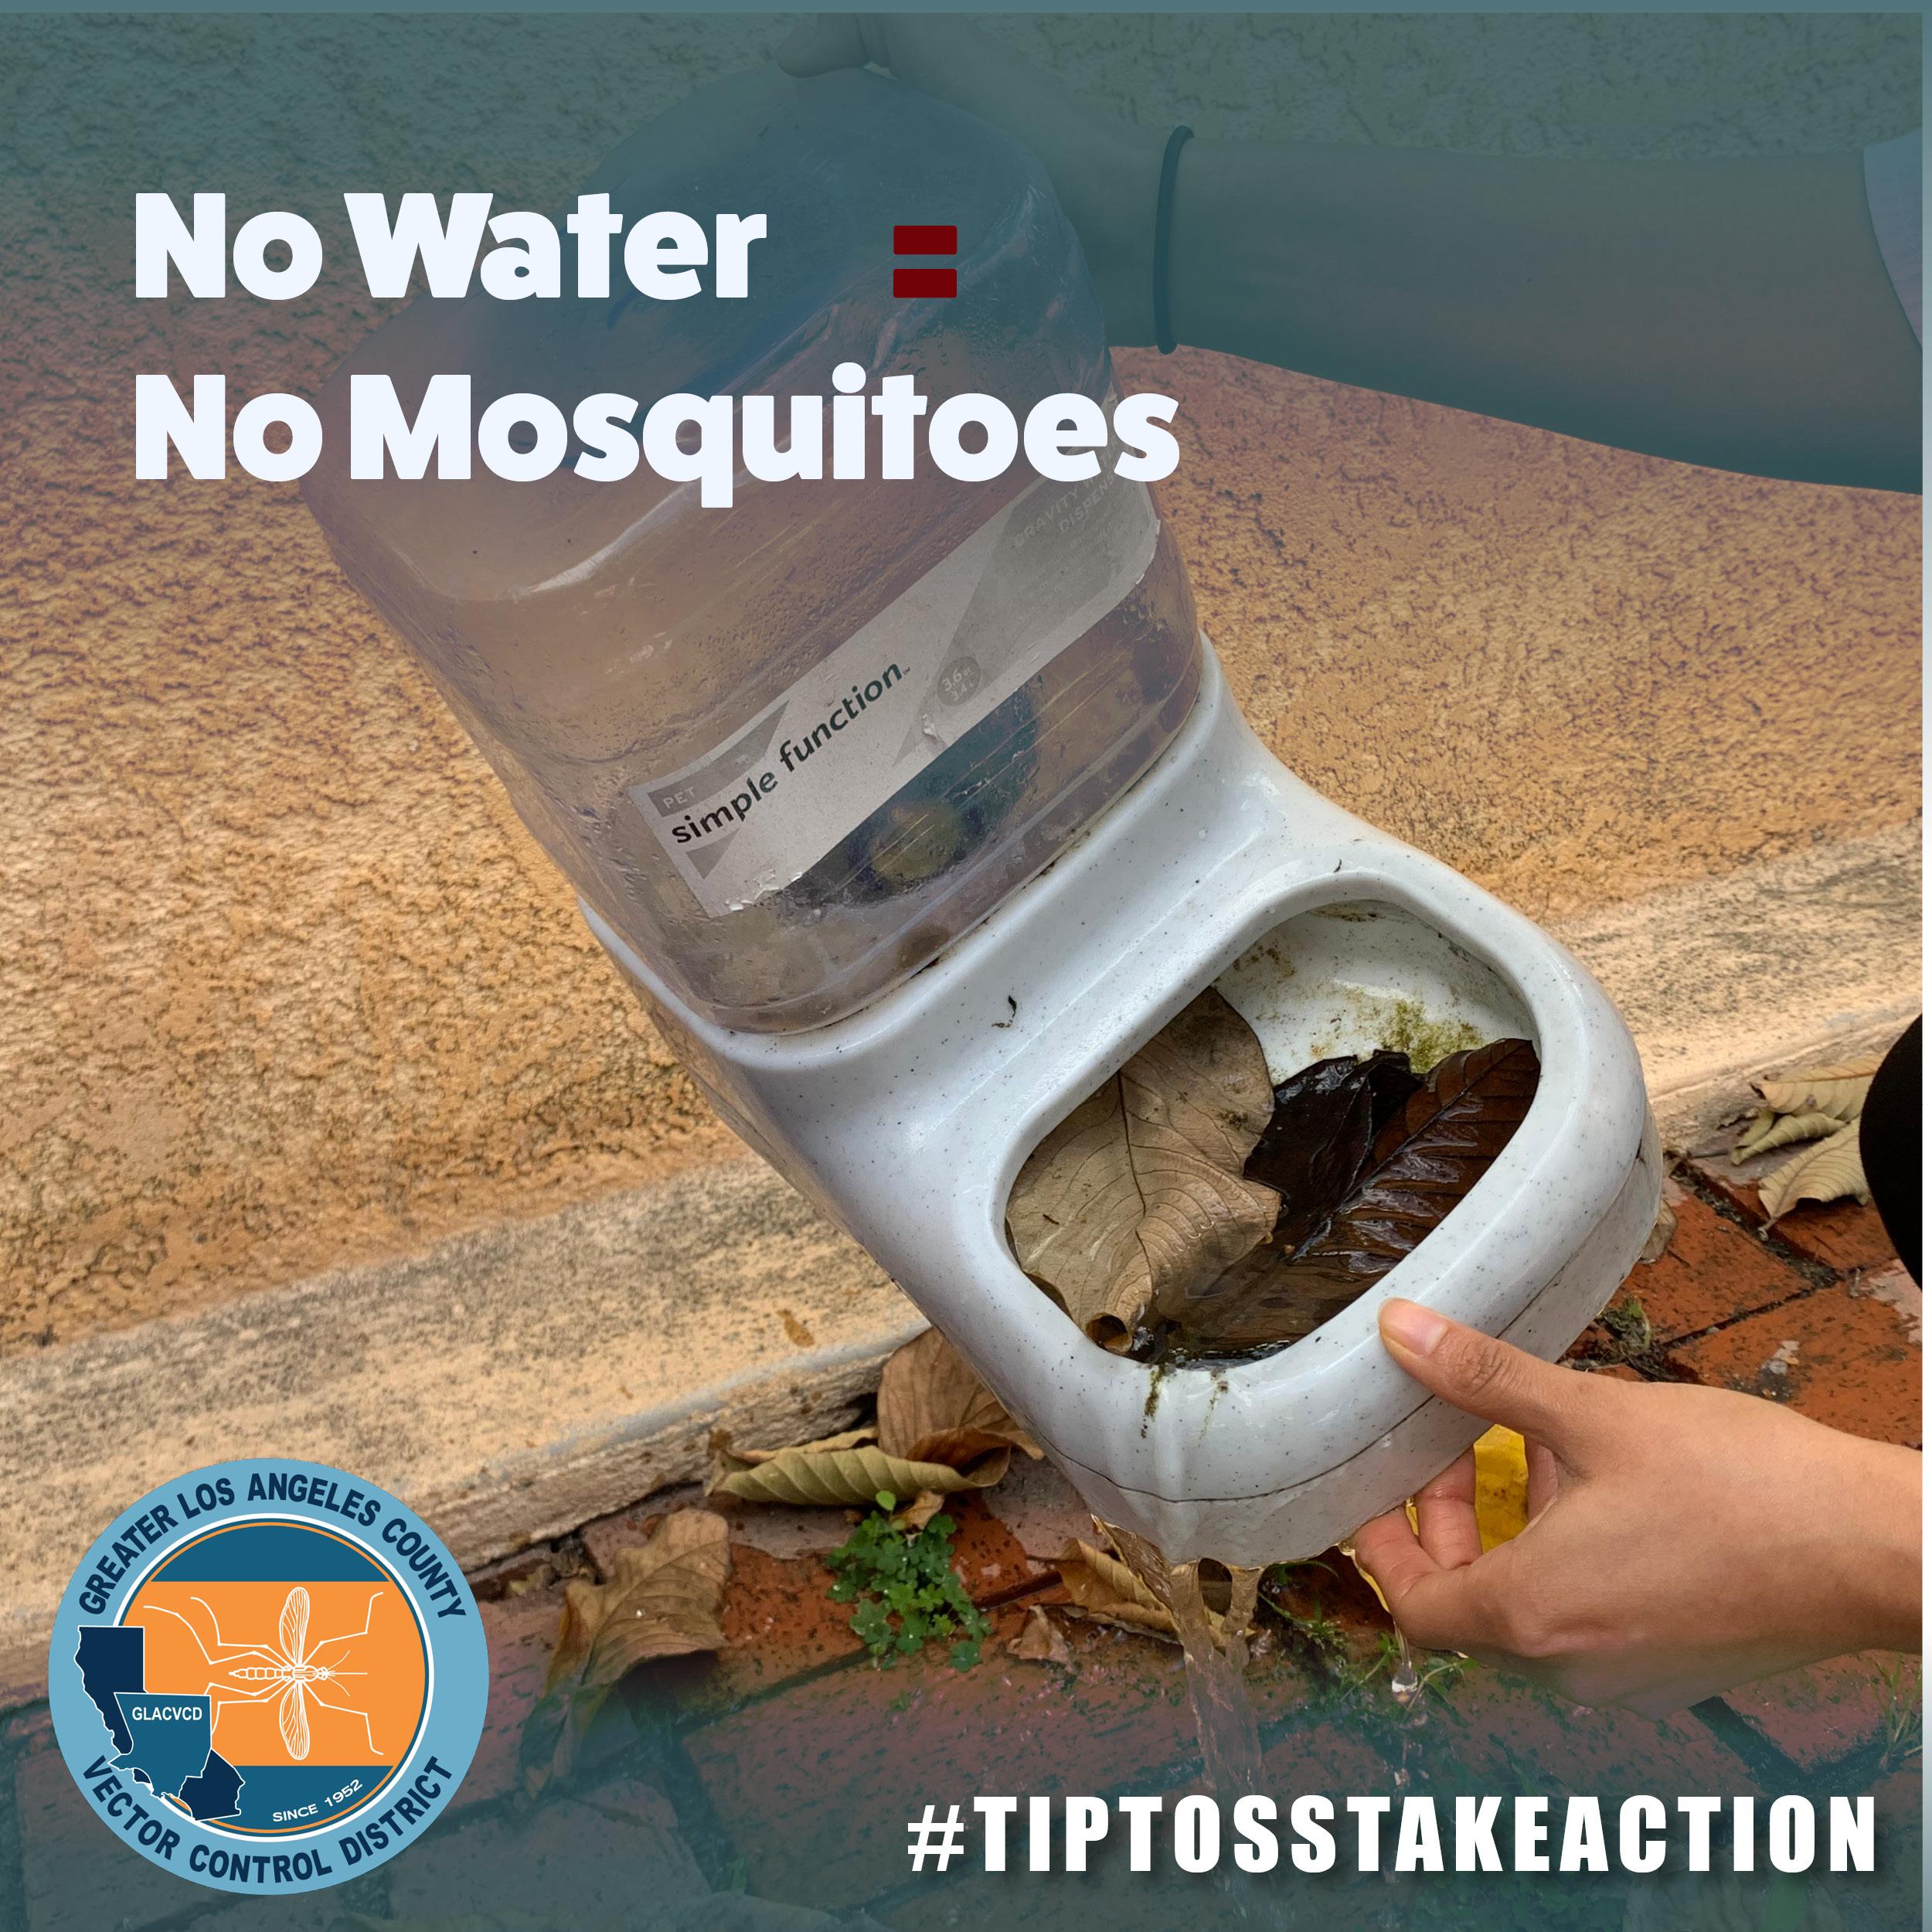 No water no mosquitos